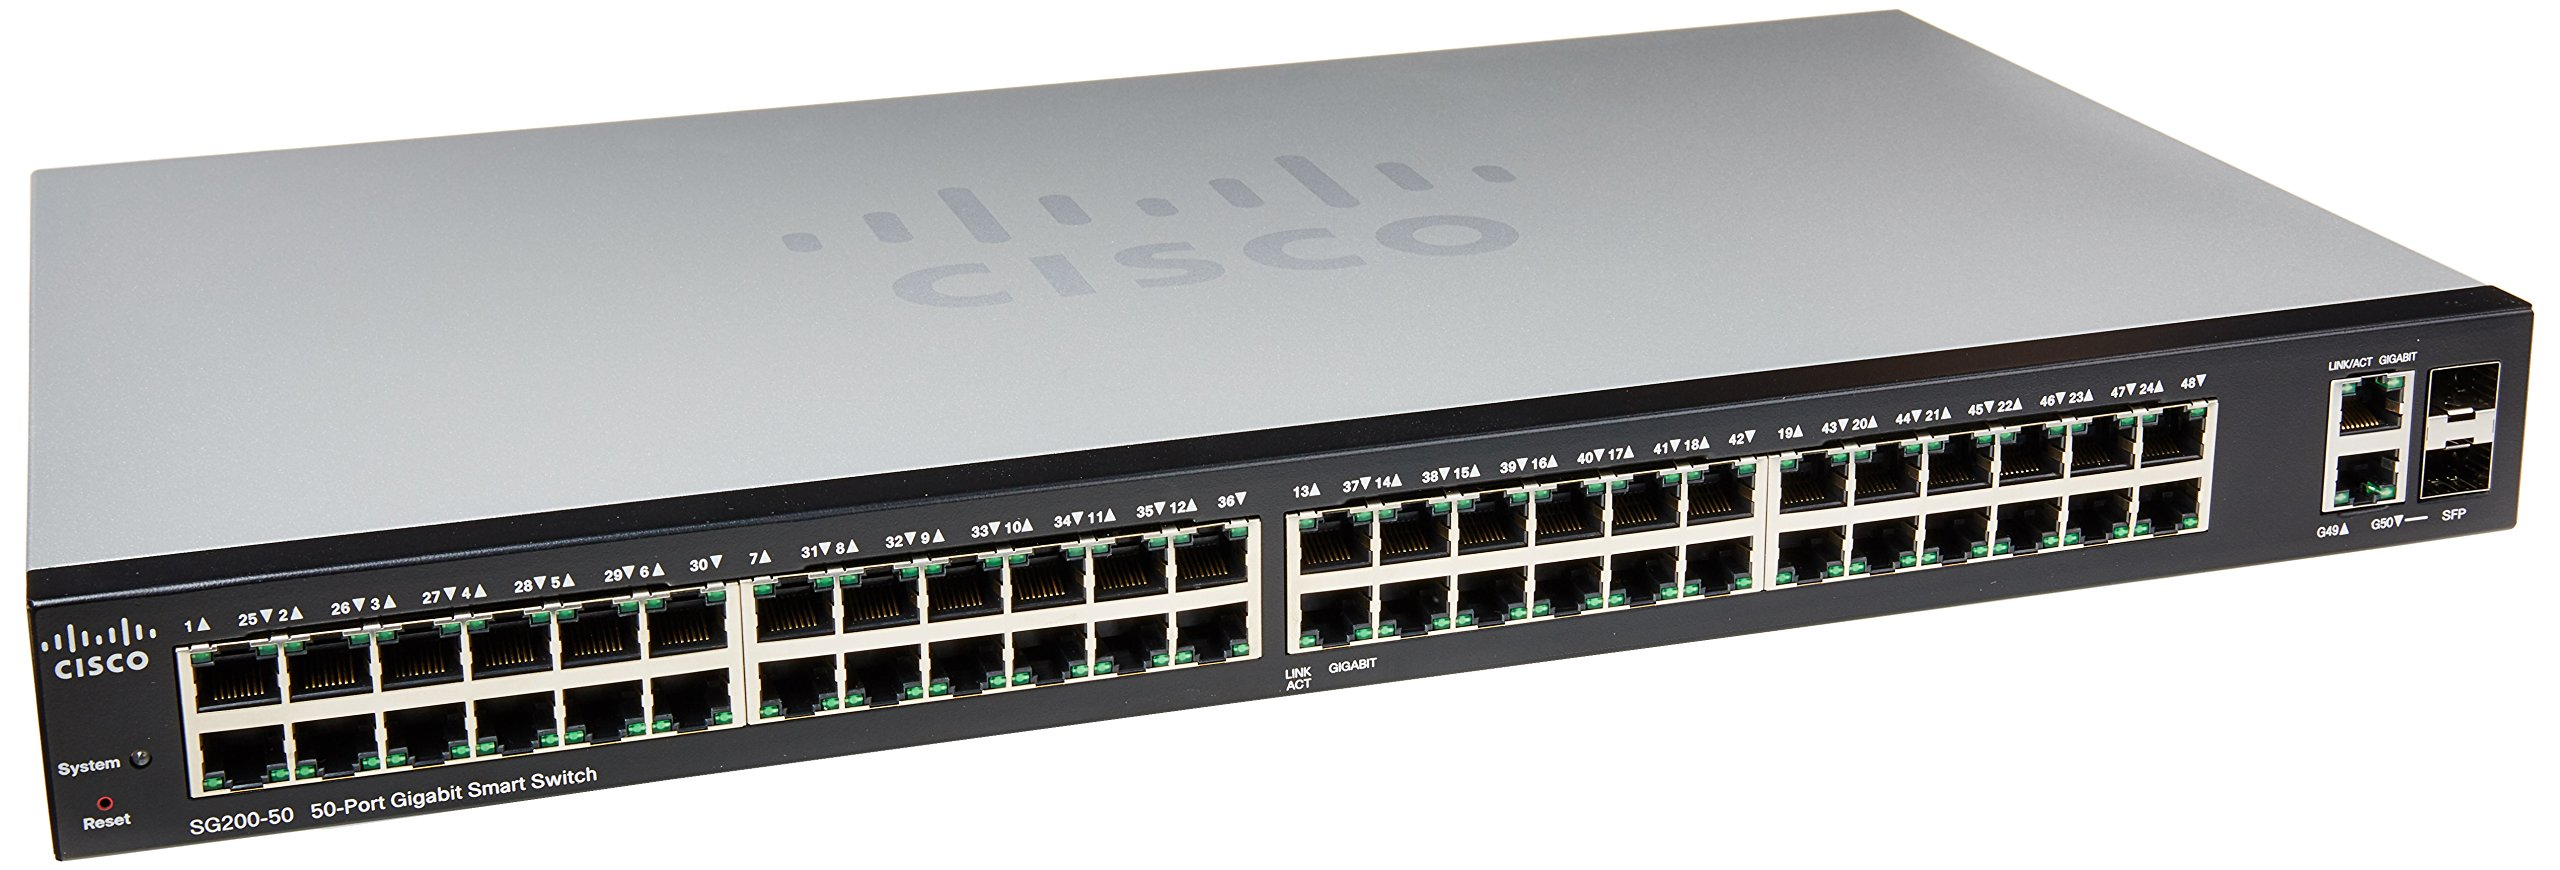 Cisco Small Business 200 Series SLM2048T-NA Smart SG200-50 Gigabit Switch 48 10/100/1000 Ports, Gigabit Ethernet Smart Switch, 2 Combo Mini-GBIC Ports by Cisco